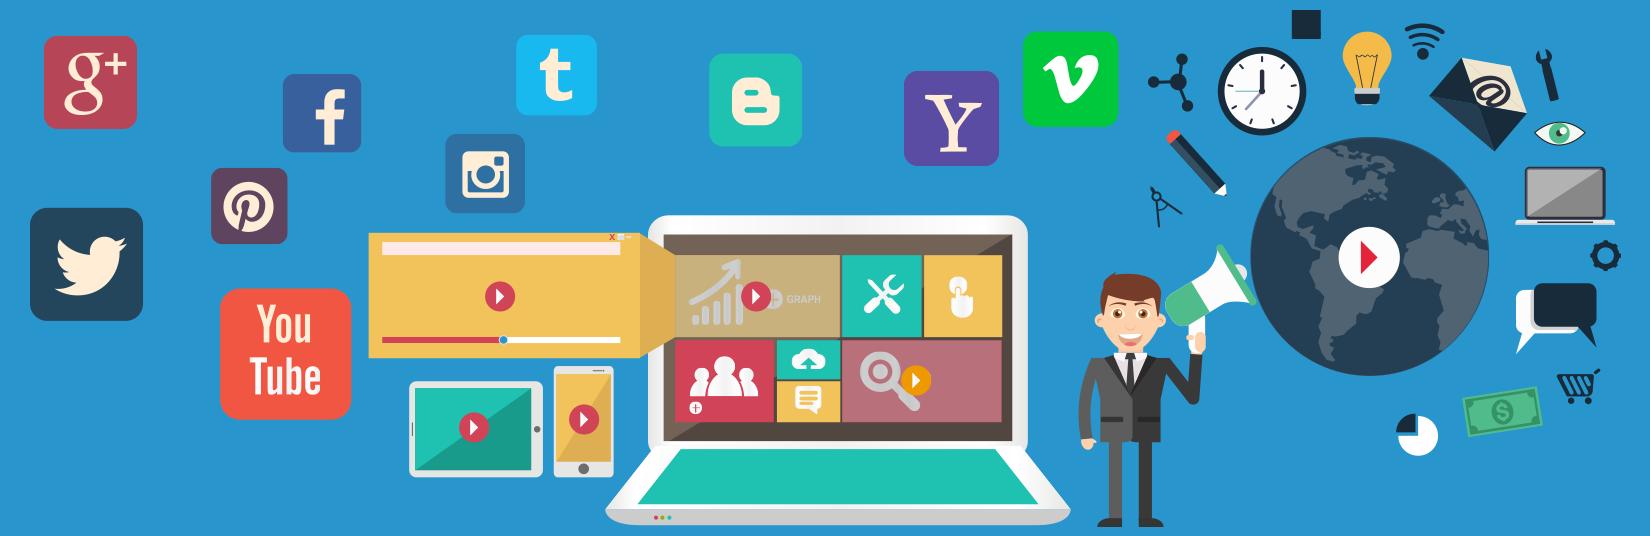 Video marketing, Channel Marketing, YouTube marketing, vimeo marketing, DailyMotion marketing